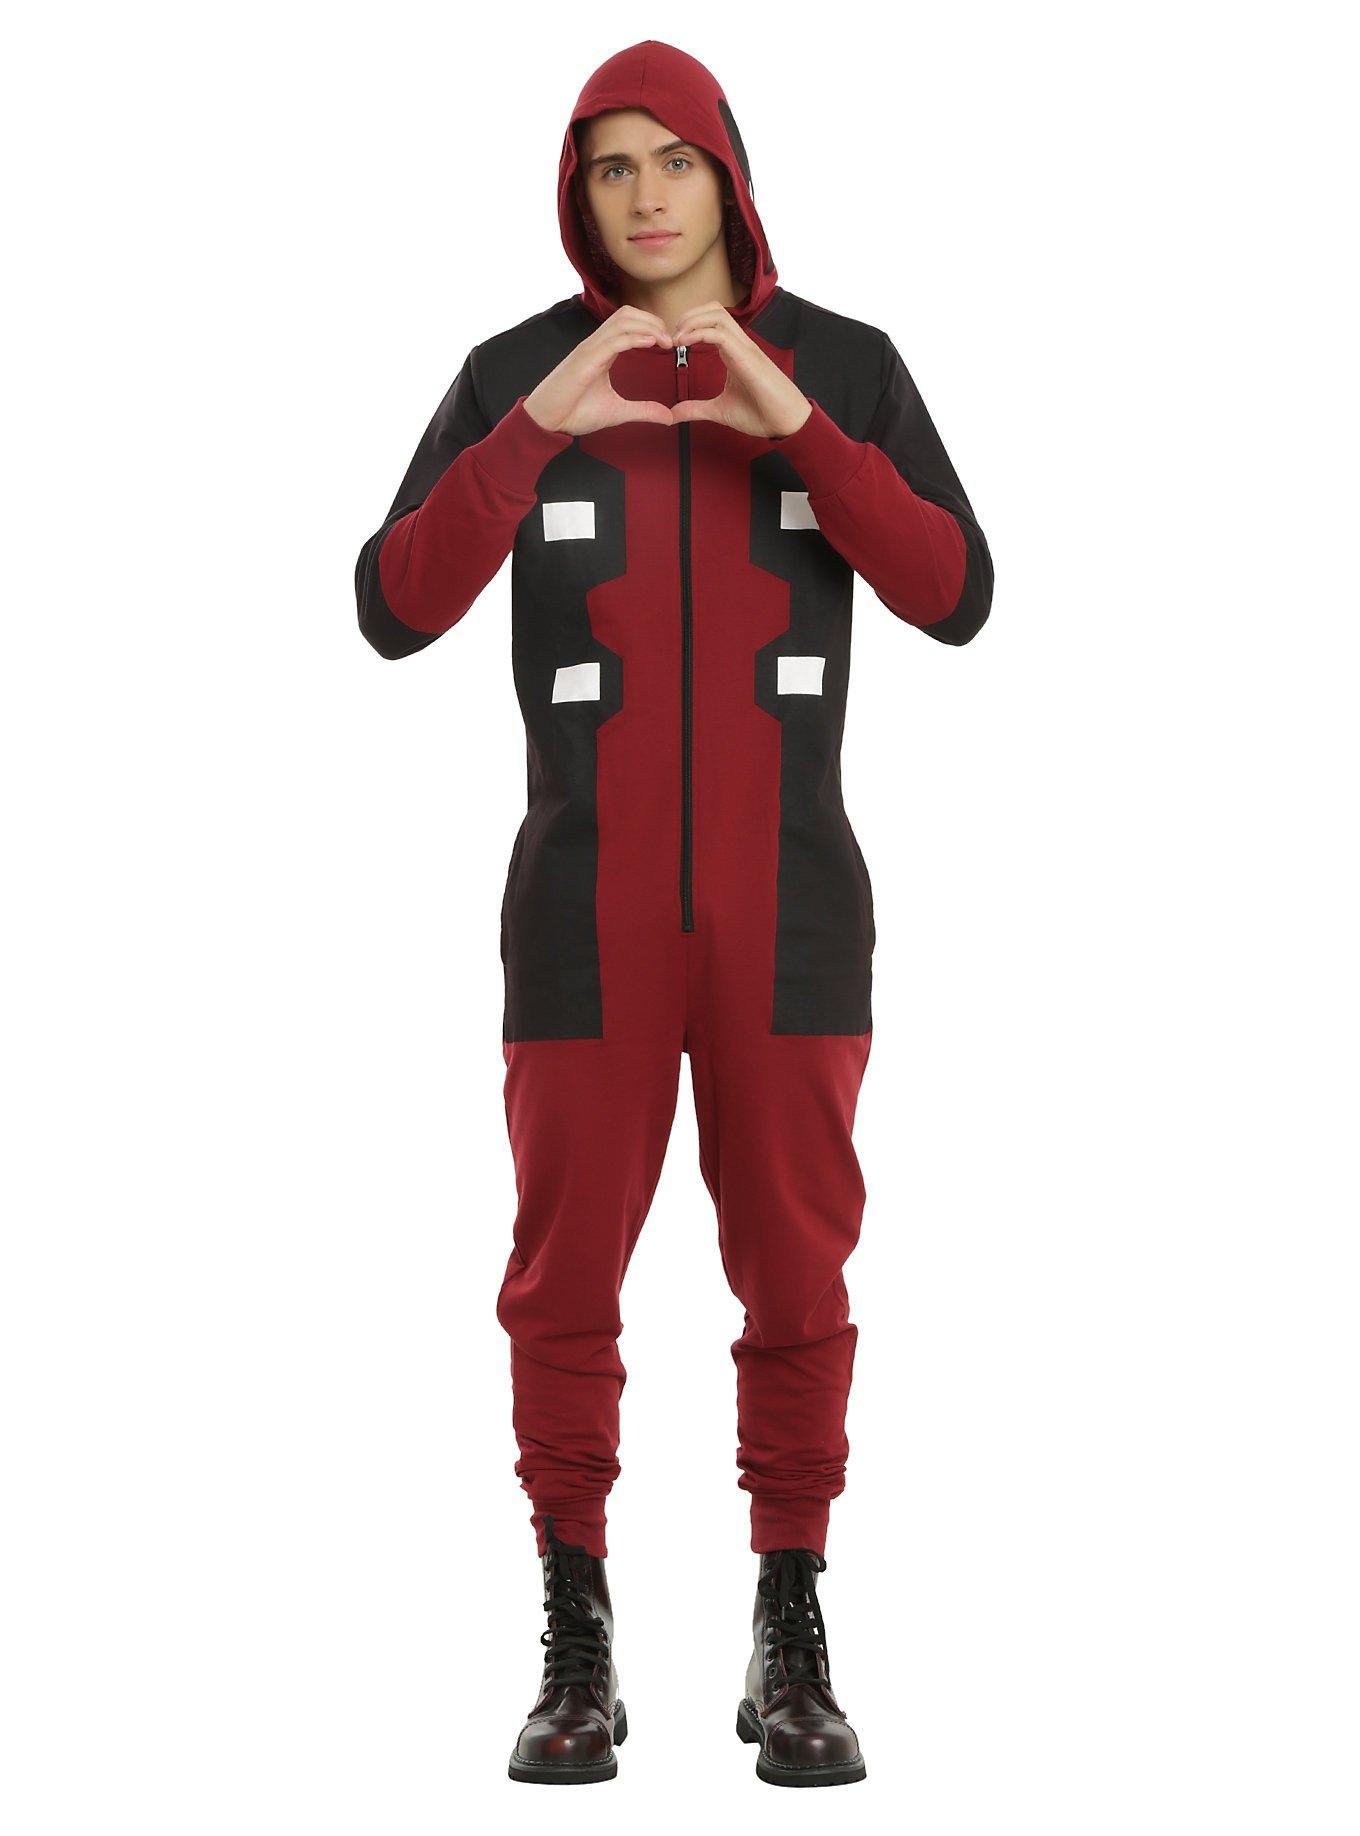 Marvel Deadpool One-Piece Union Suit Cosplay Pajamas